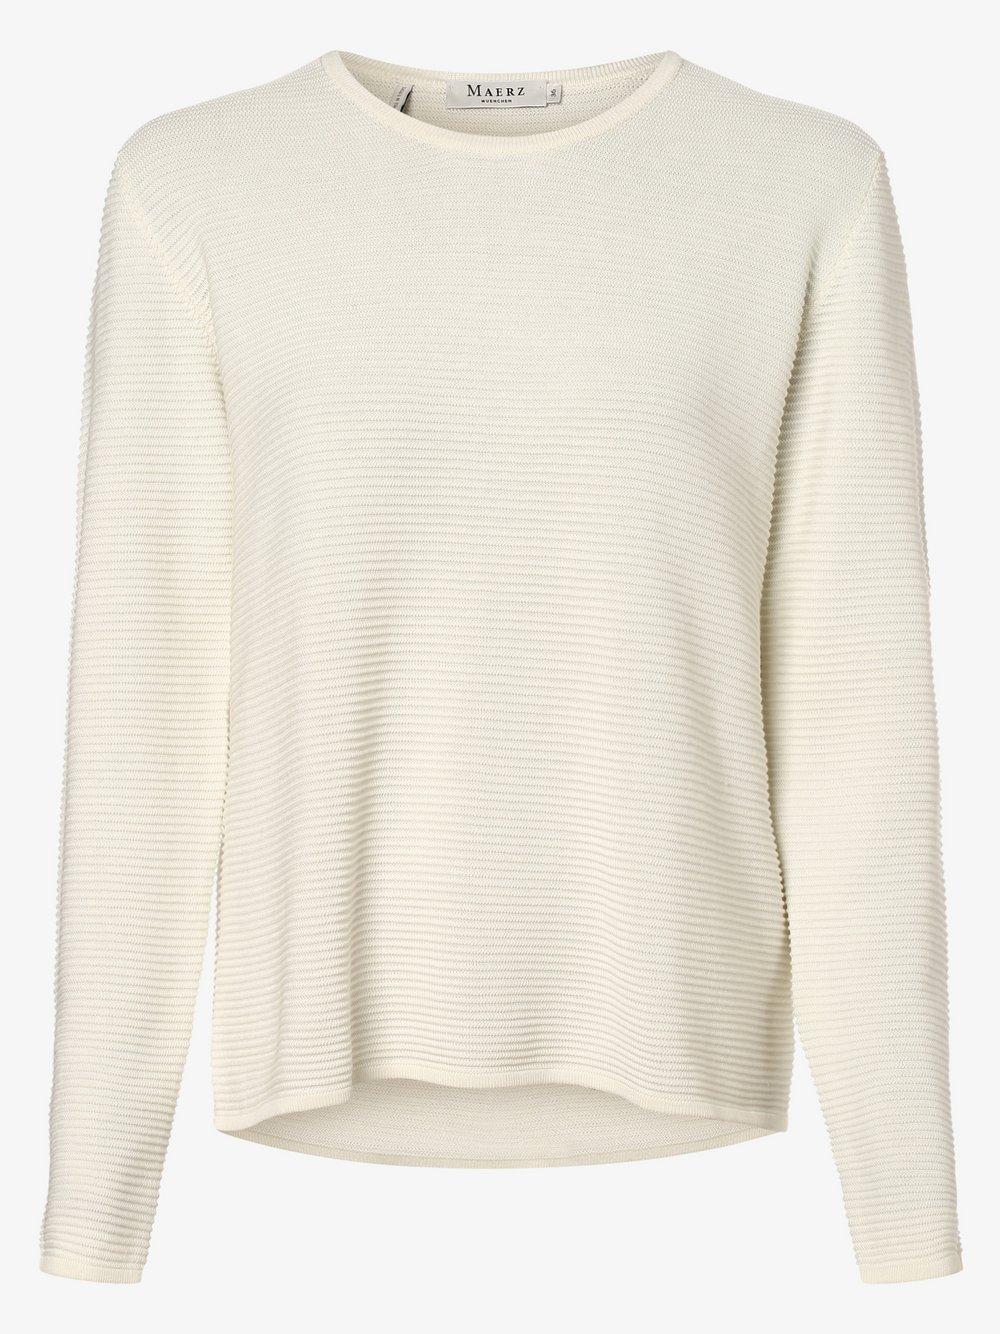 März – Sweter damski, biały Van Graaf 485800-0002